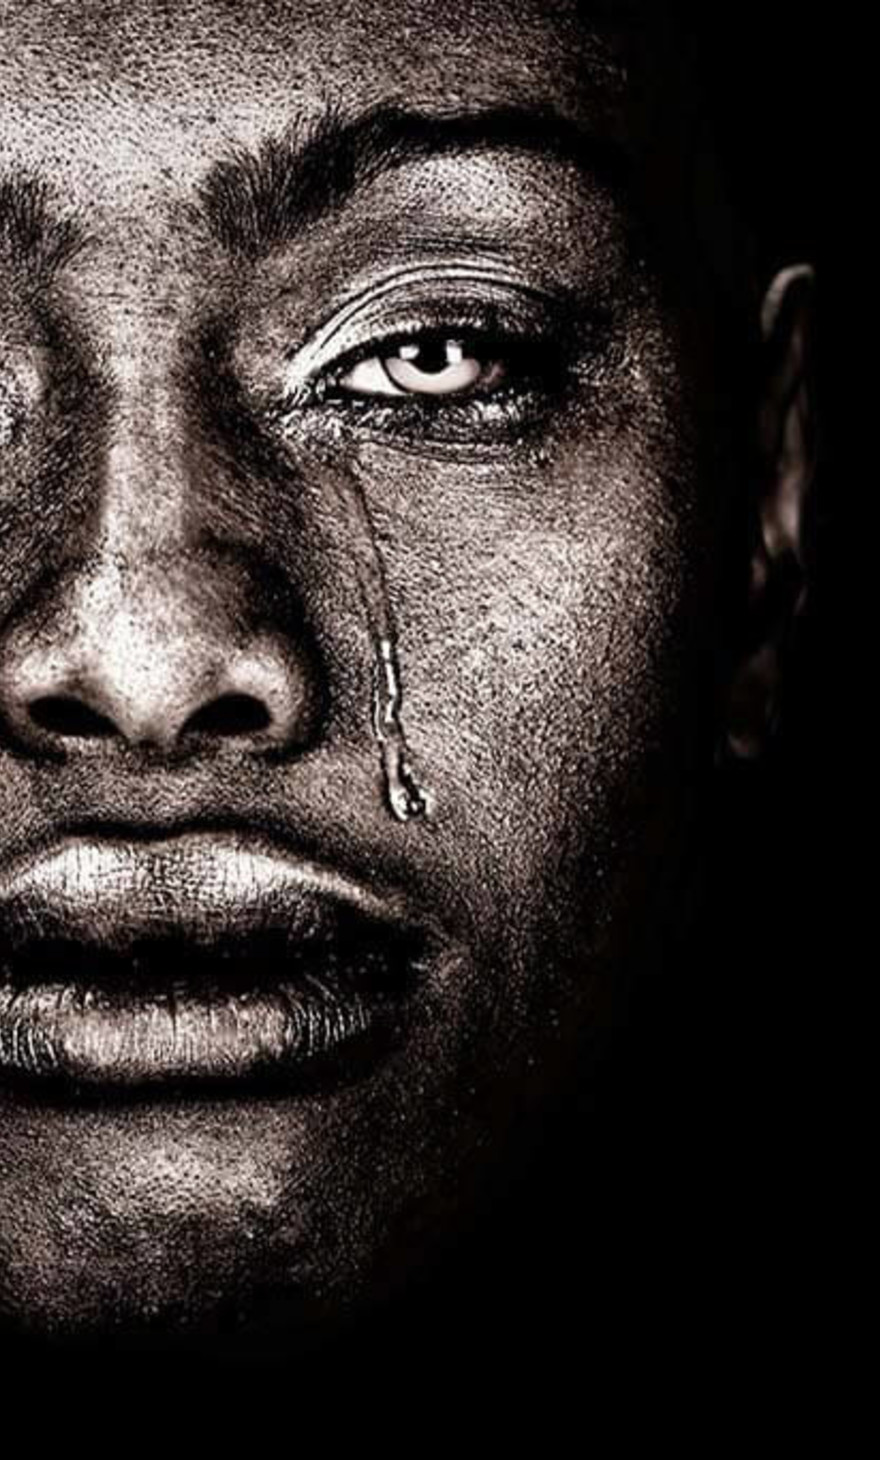 Afro woman tears